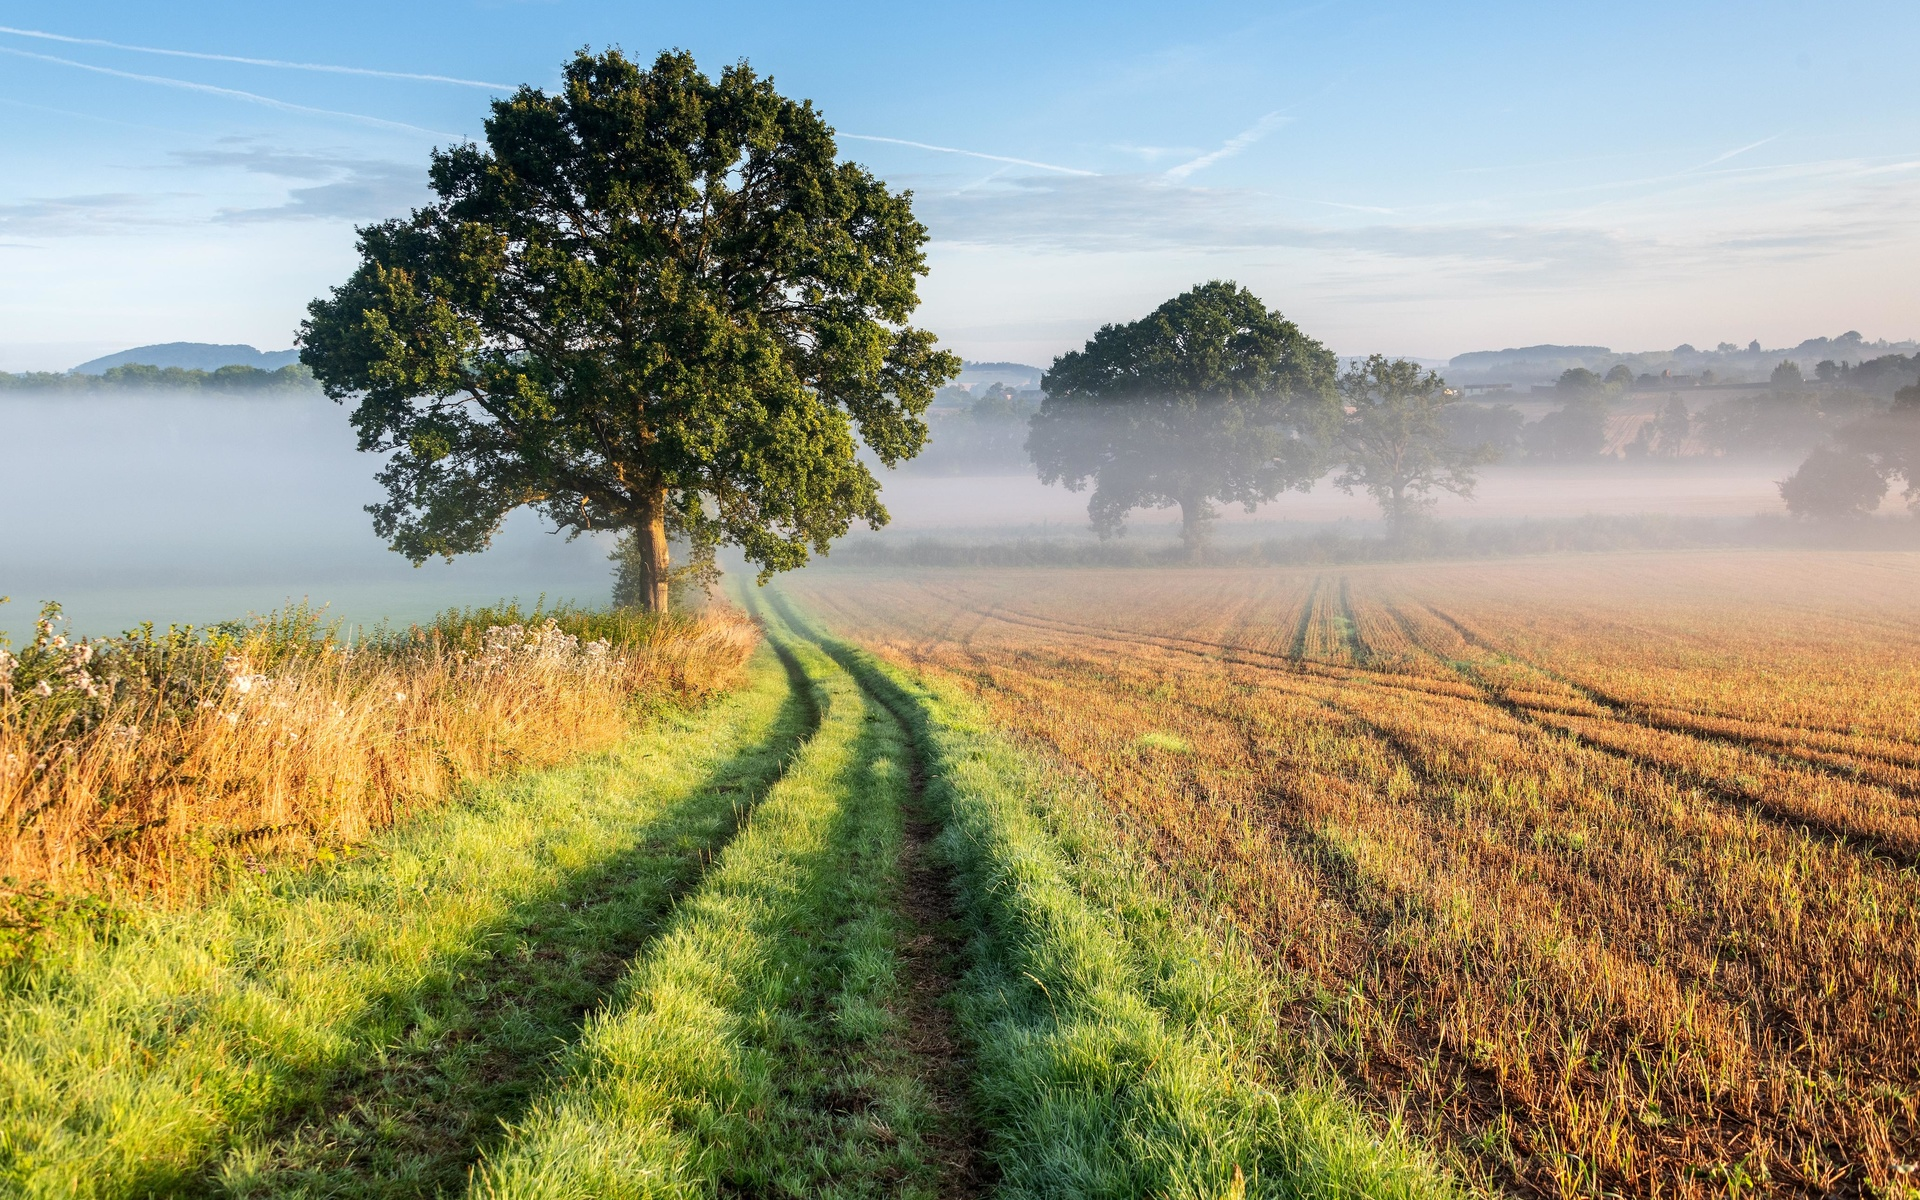 дерево, дорога, трава, туман